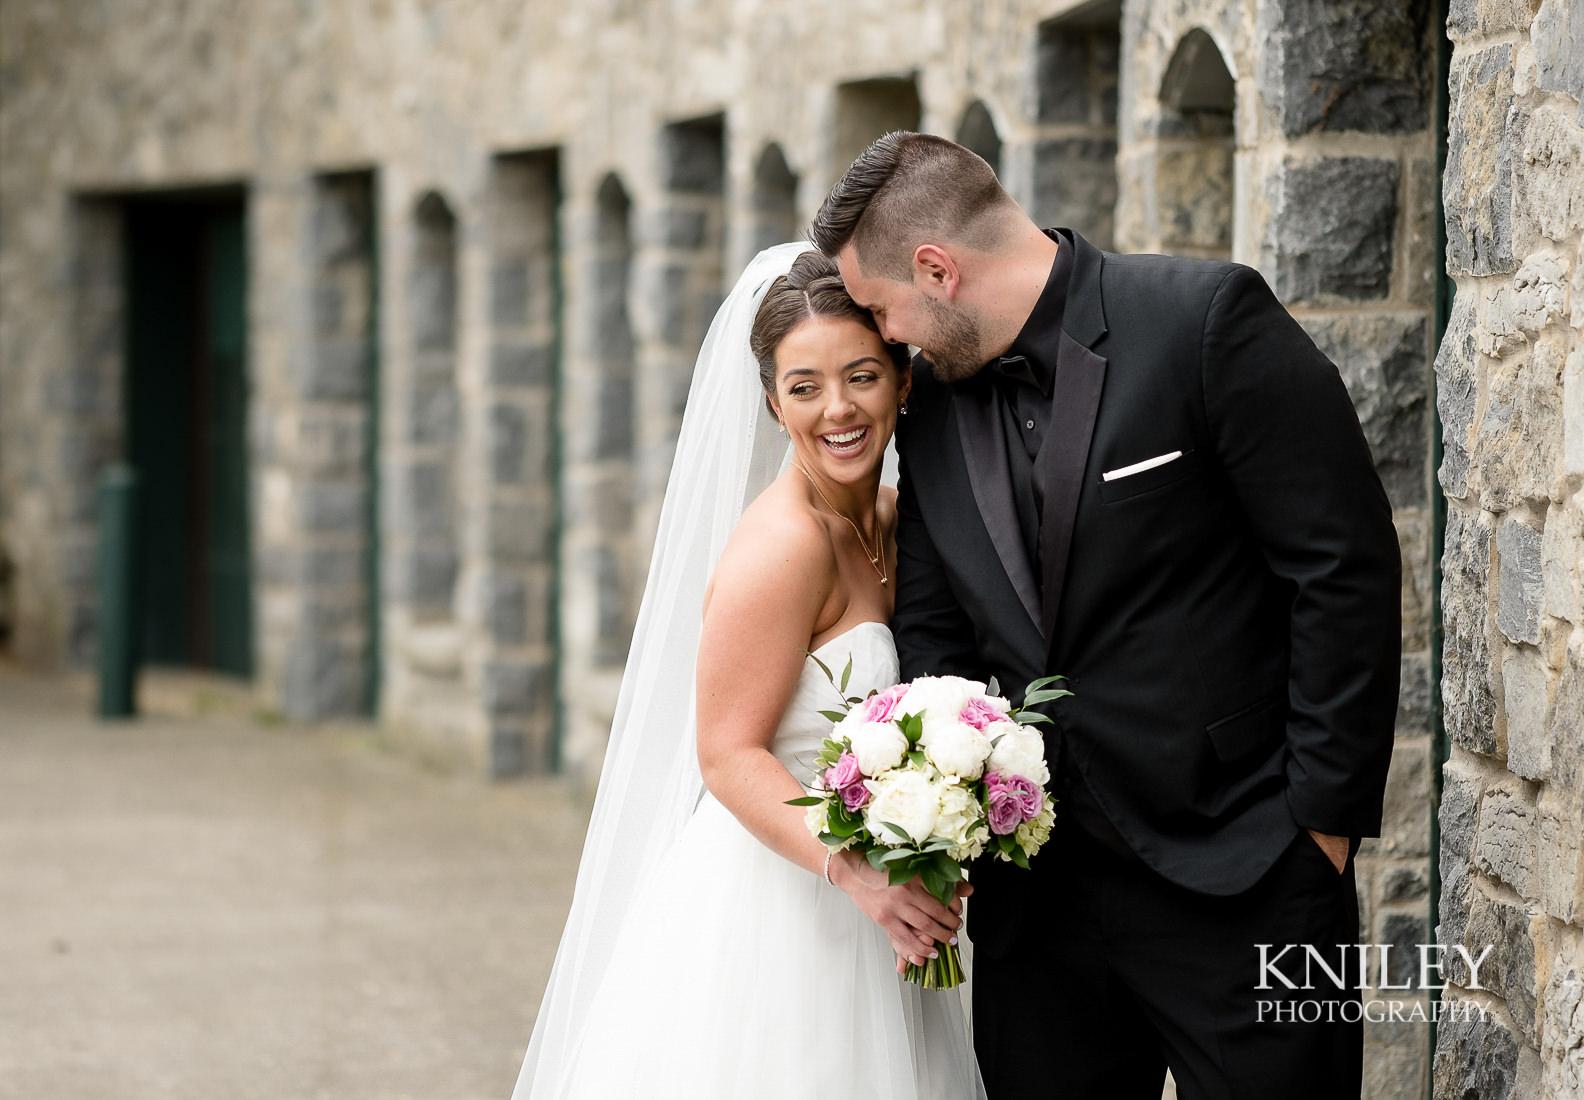 049 - Hoyt Lake Buffalo NY Wedding Pictures -XT2A7724.jpg